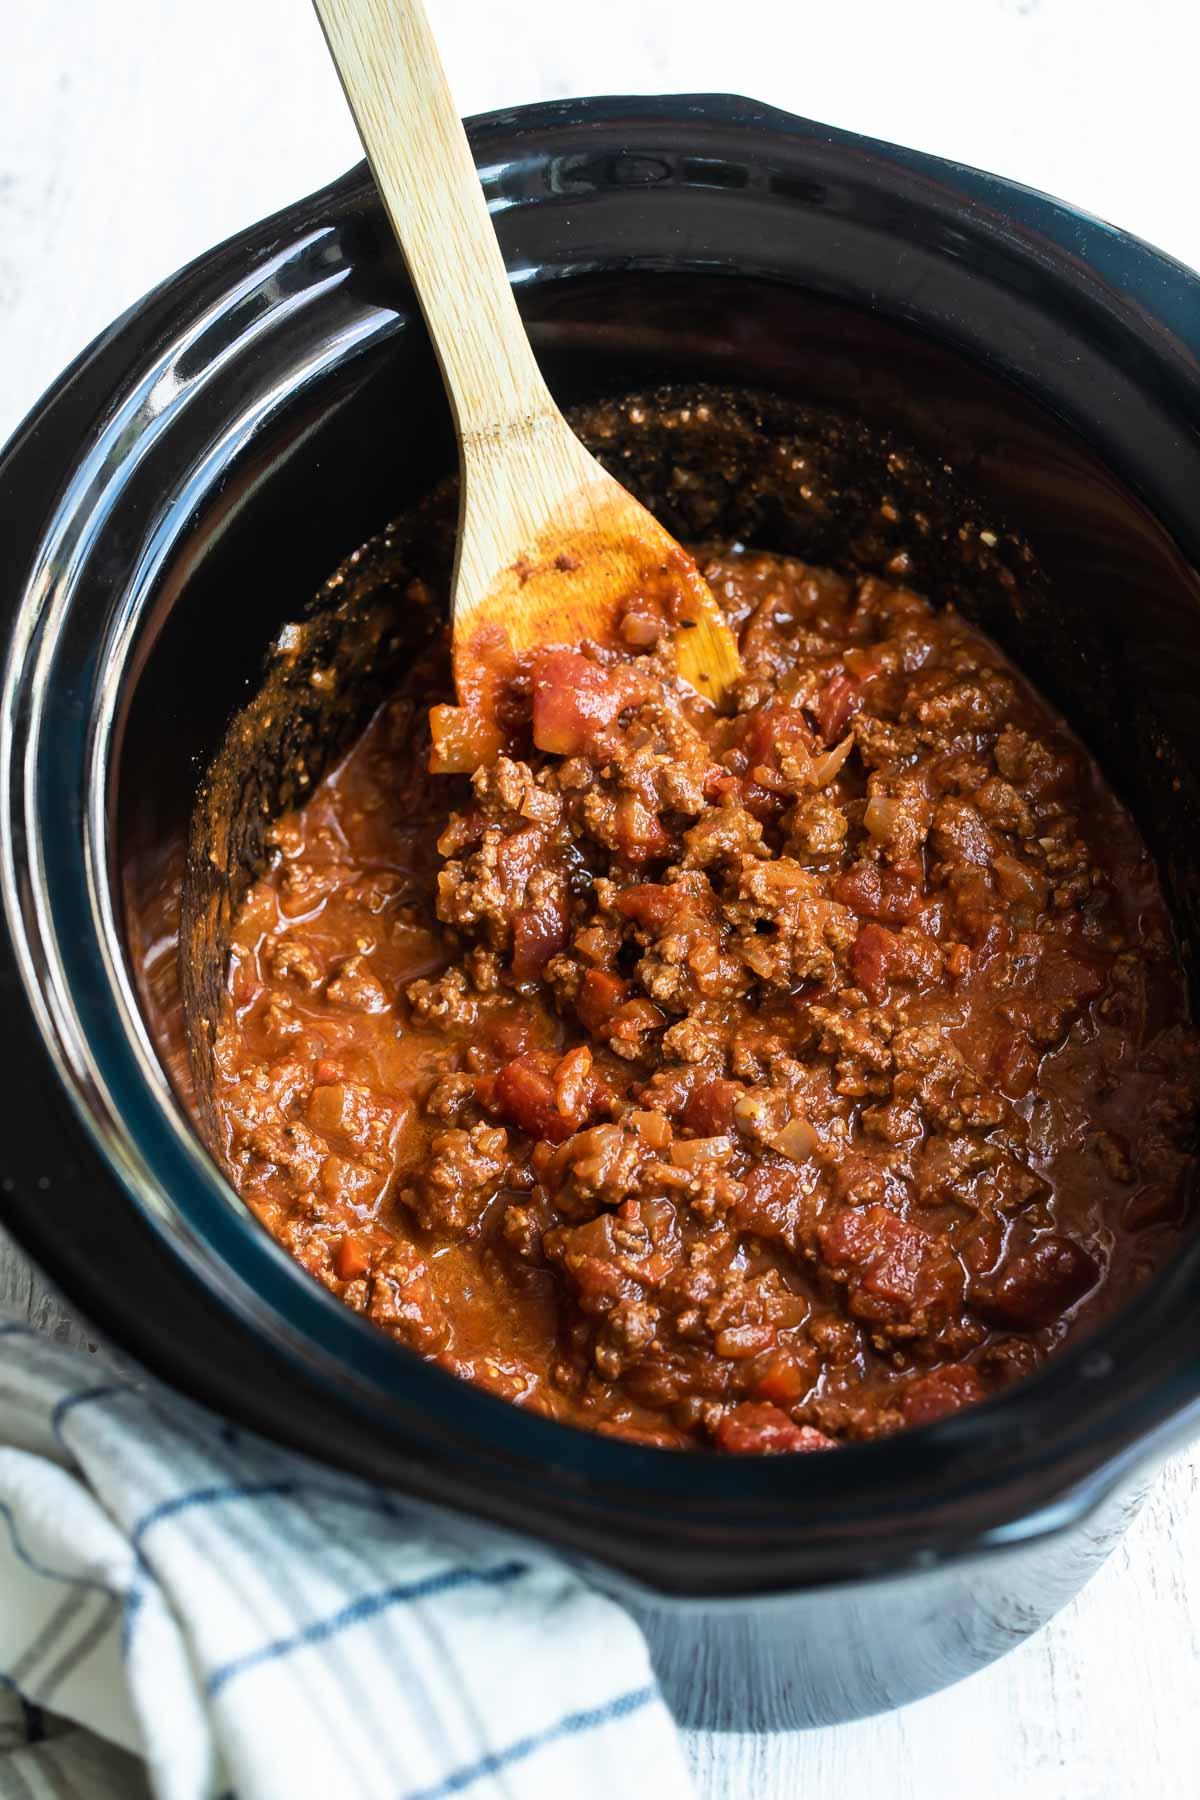 Hot dog chili in a crock pot.